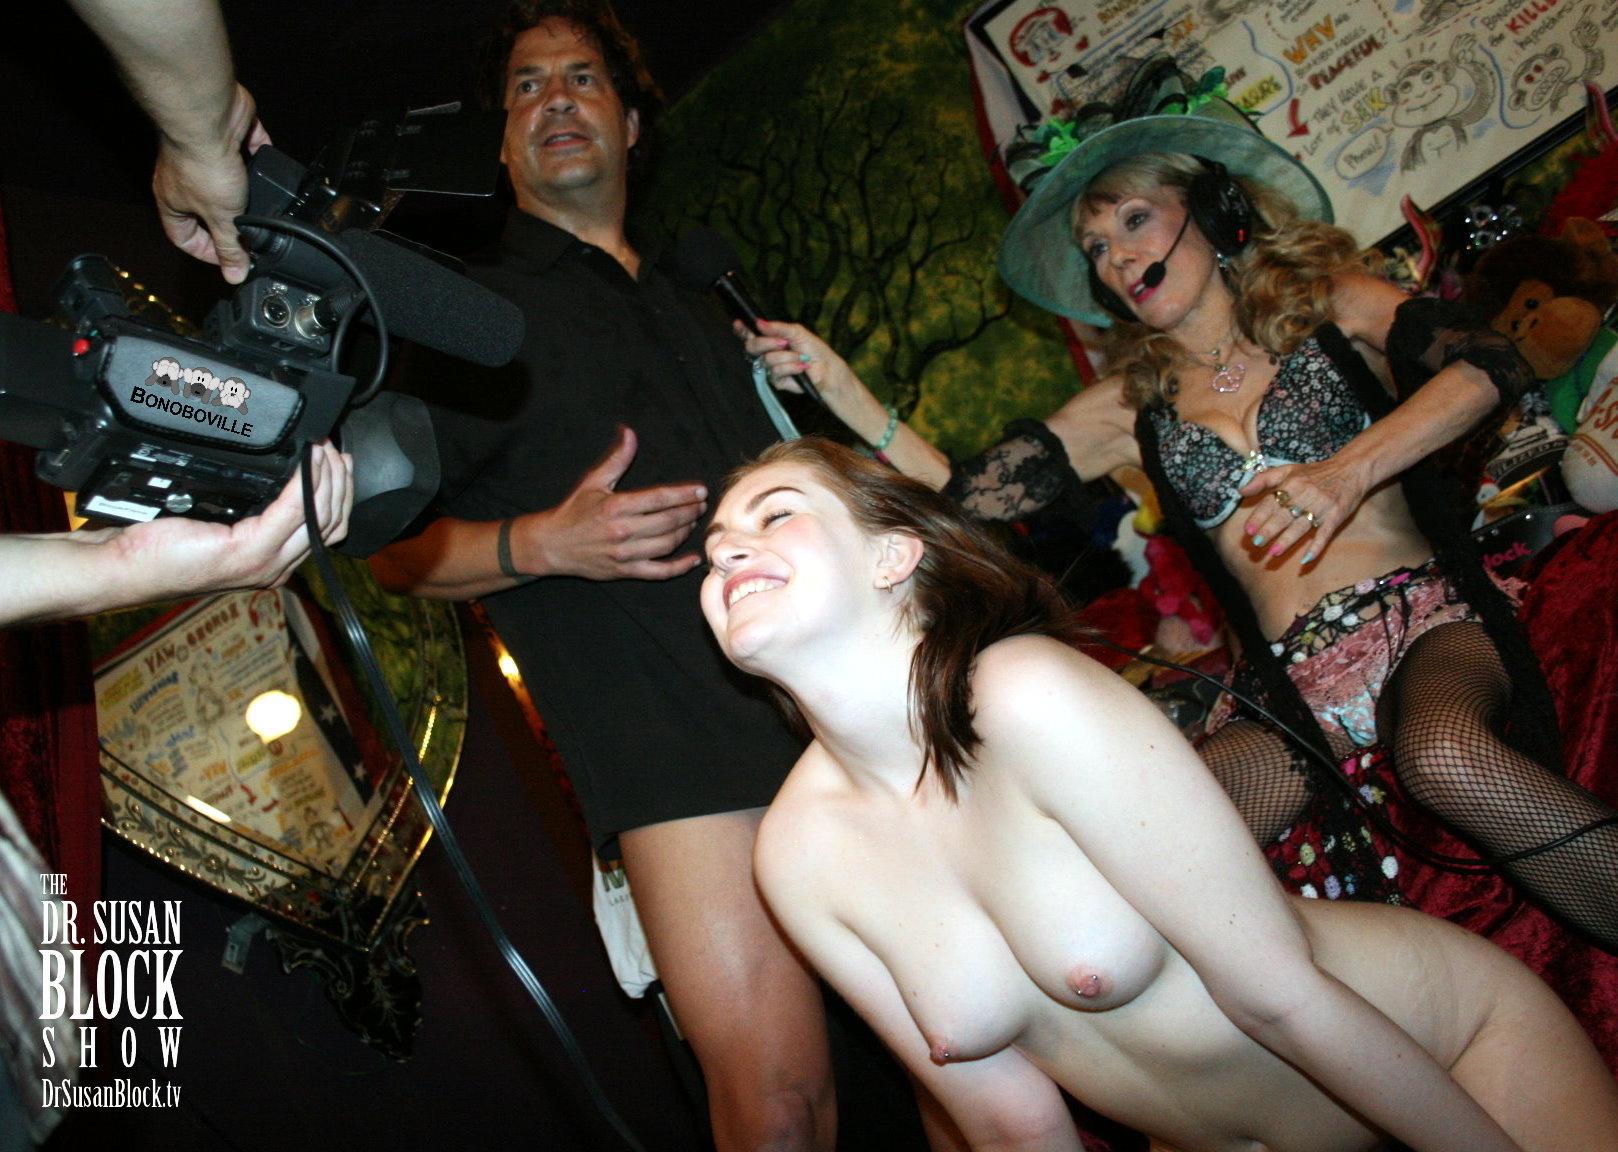 ErotiqueTV Sex Olympics on DrSuzy.Tv!